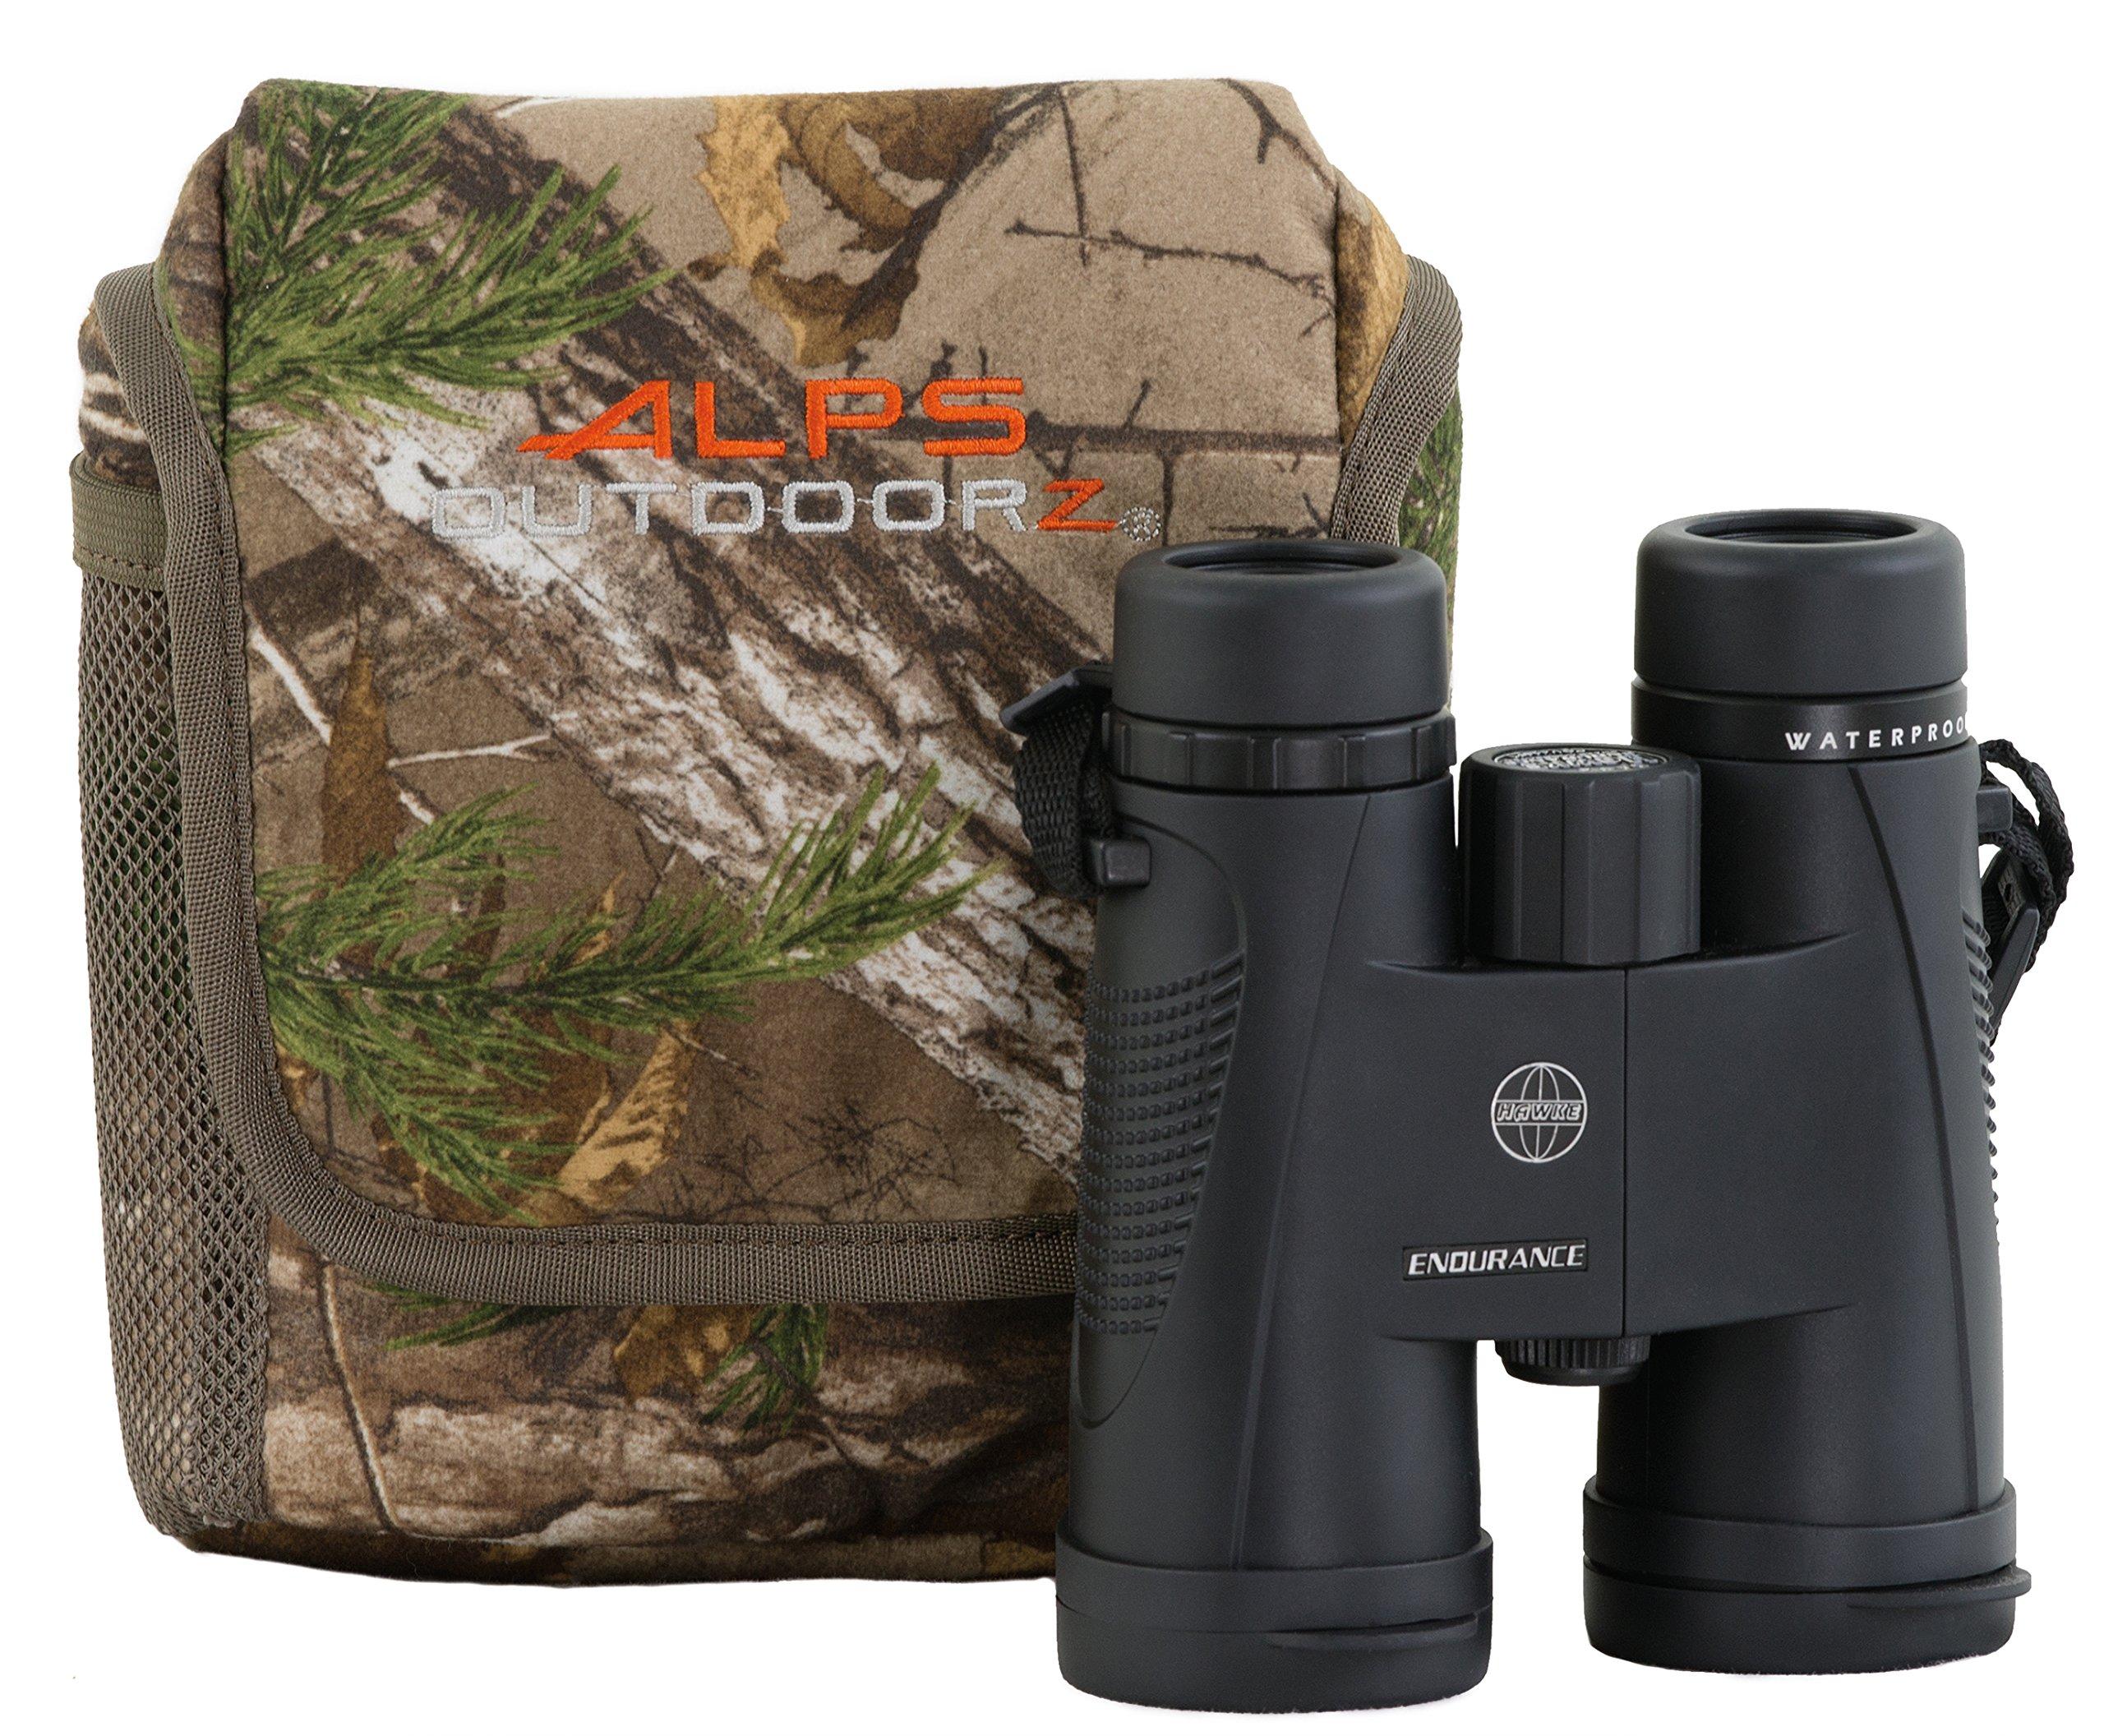 ALPS OutdoorZ Accessory Binocular Pocket, Realtree Xtra